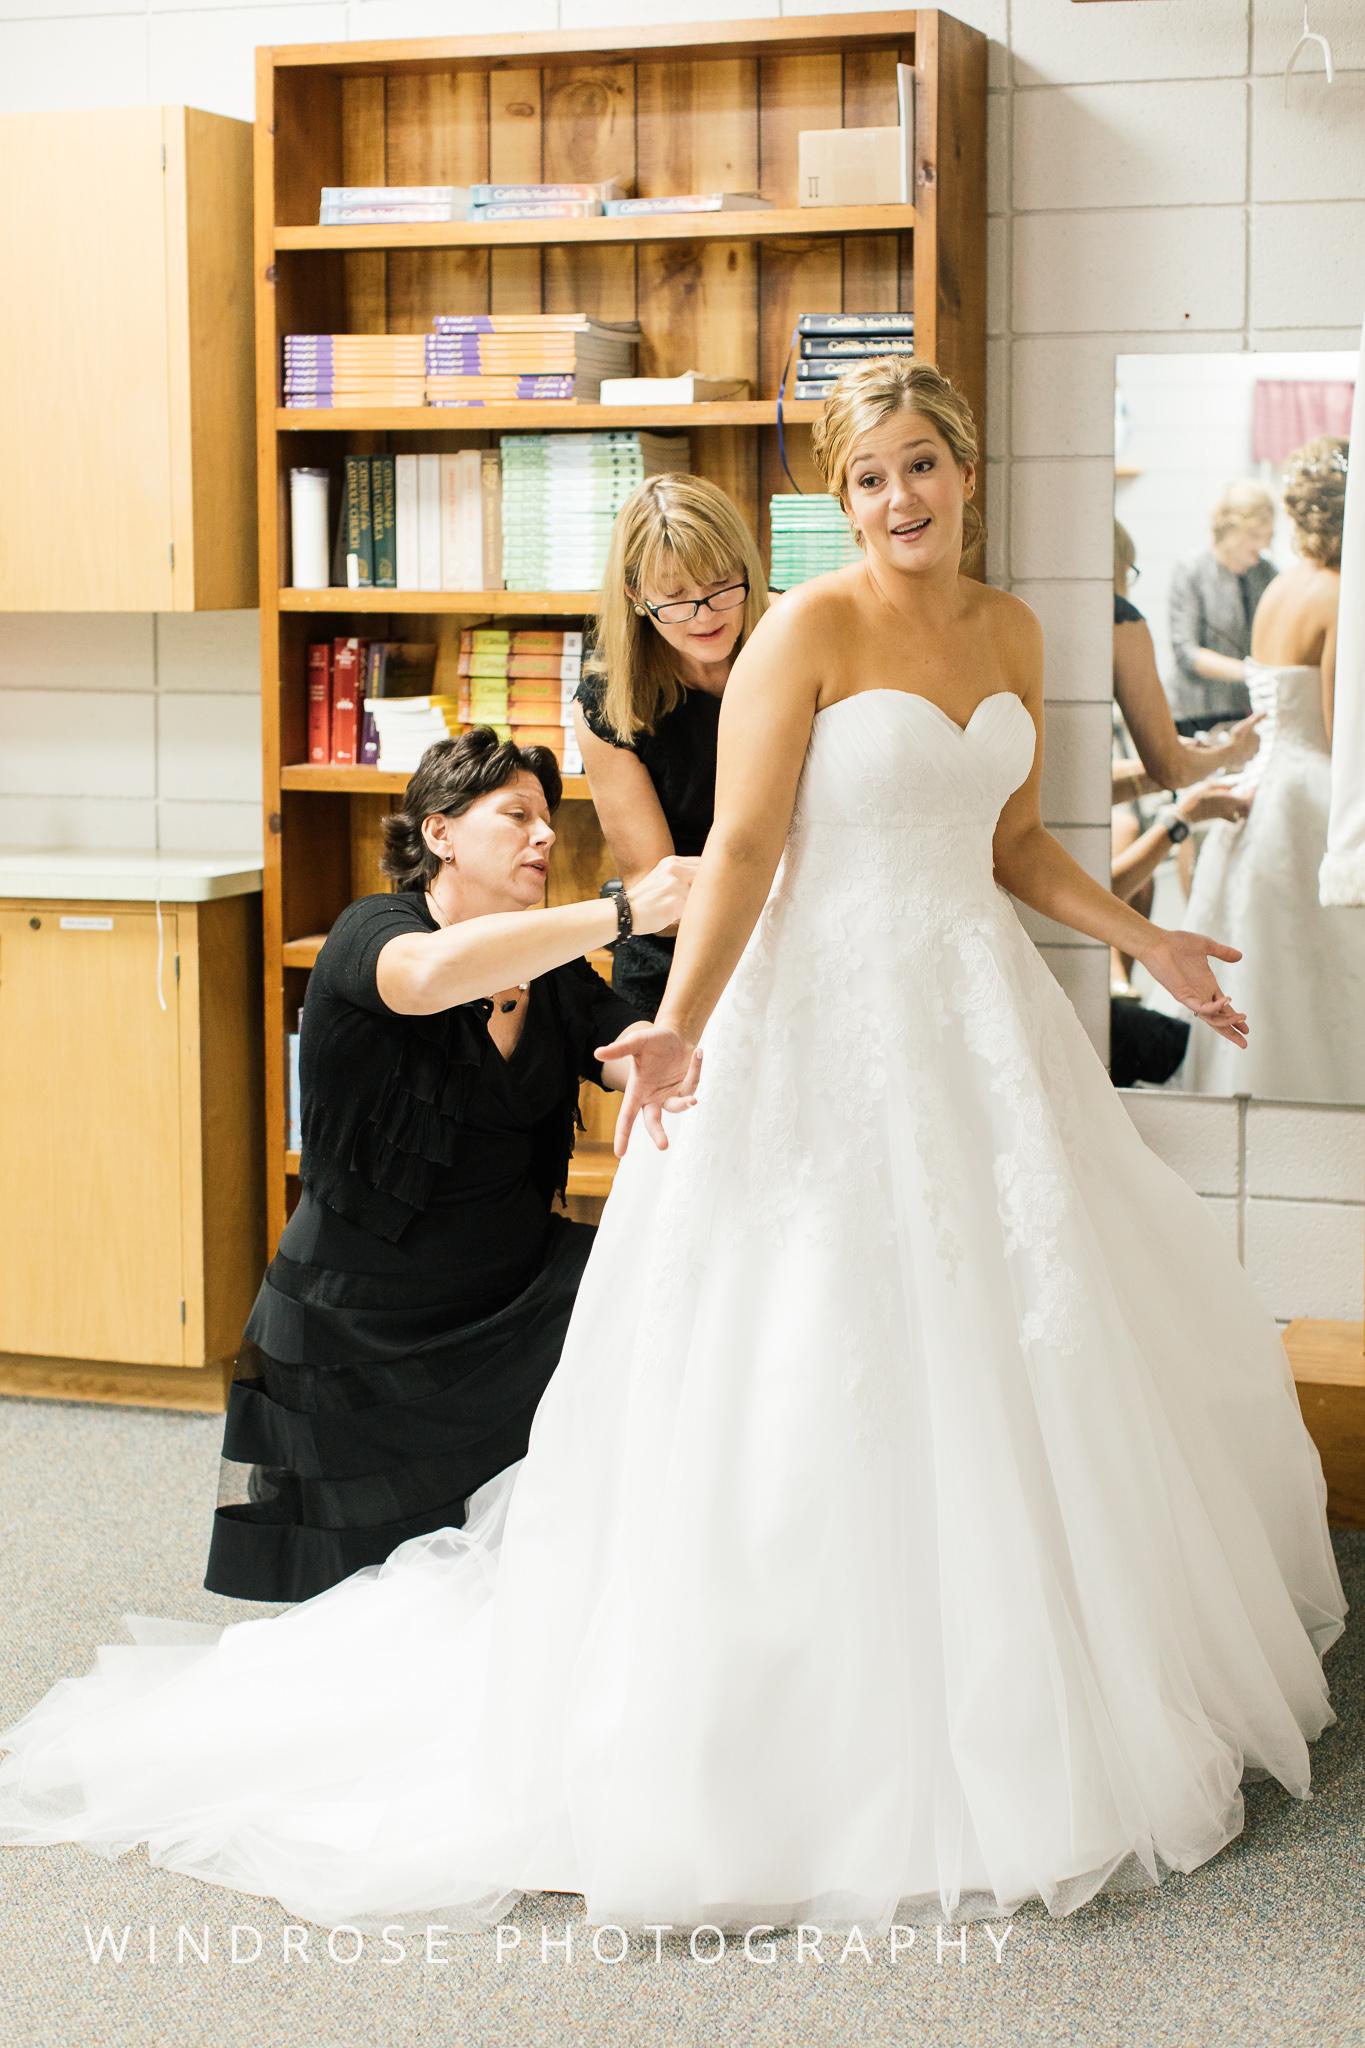 Rochester-MN-Wedding-Photo-4.jpg